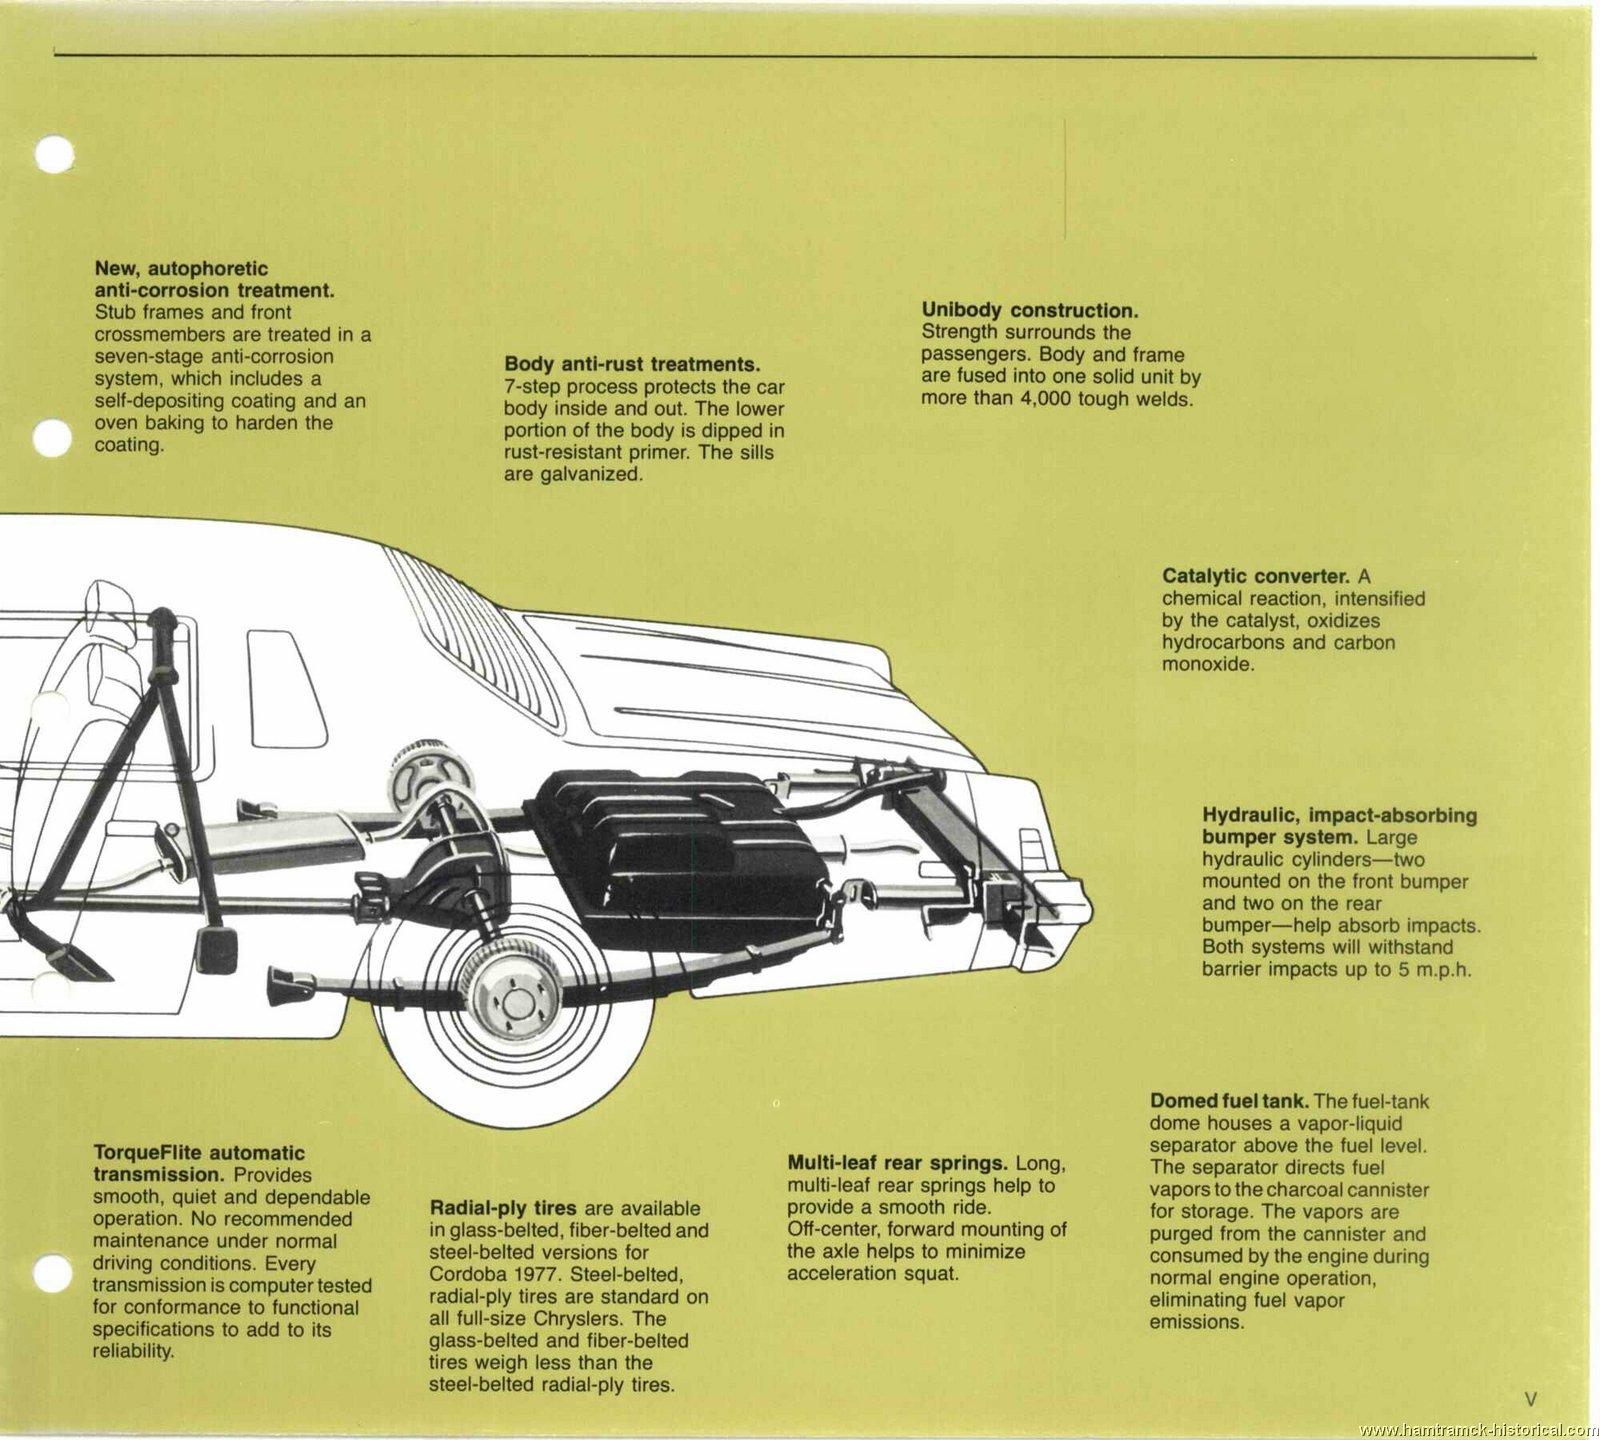 The 1970 Hamtramck Registry 1977 Chrysler Dealership Data Book Cordoba Wiring Diagram Image 77 Engineering 0003